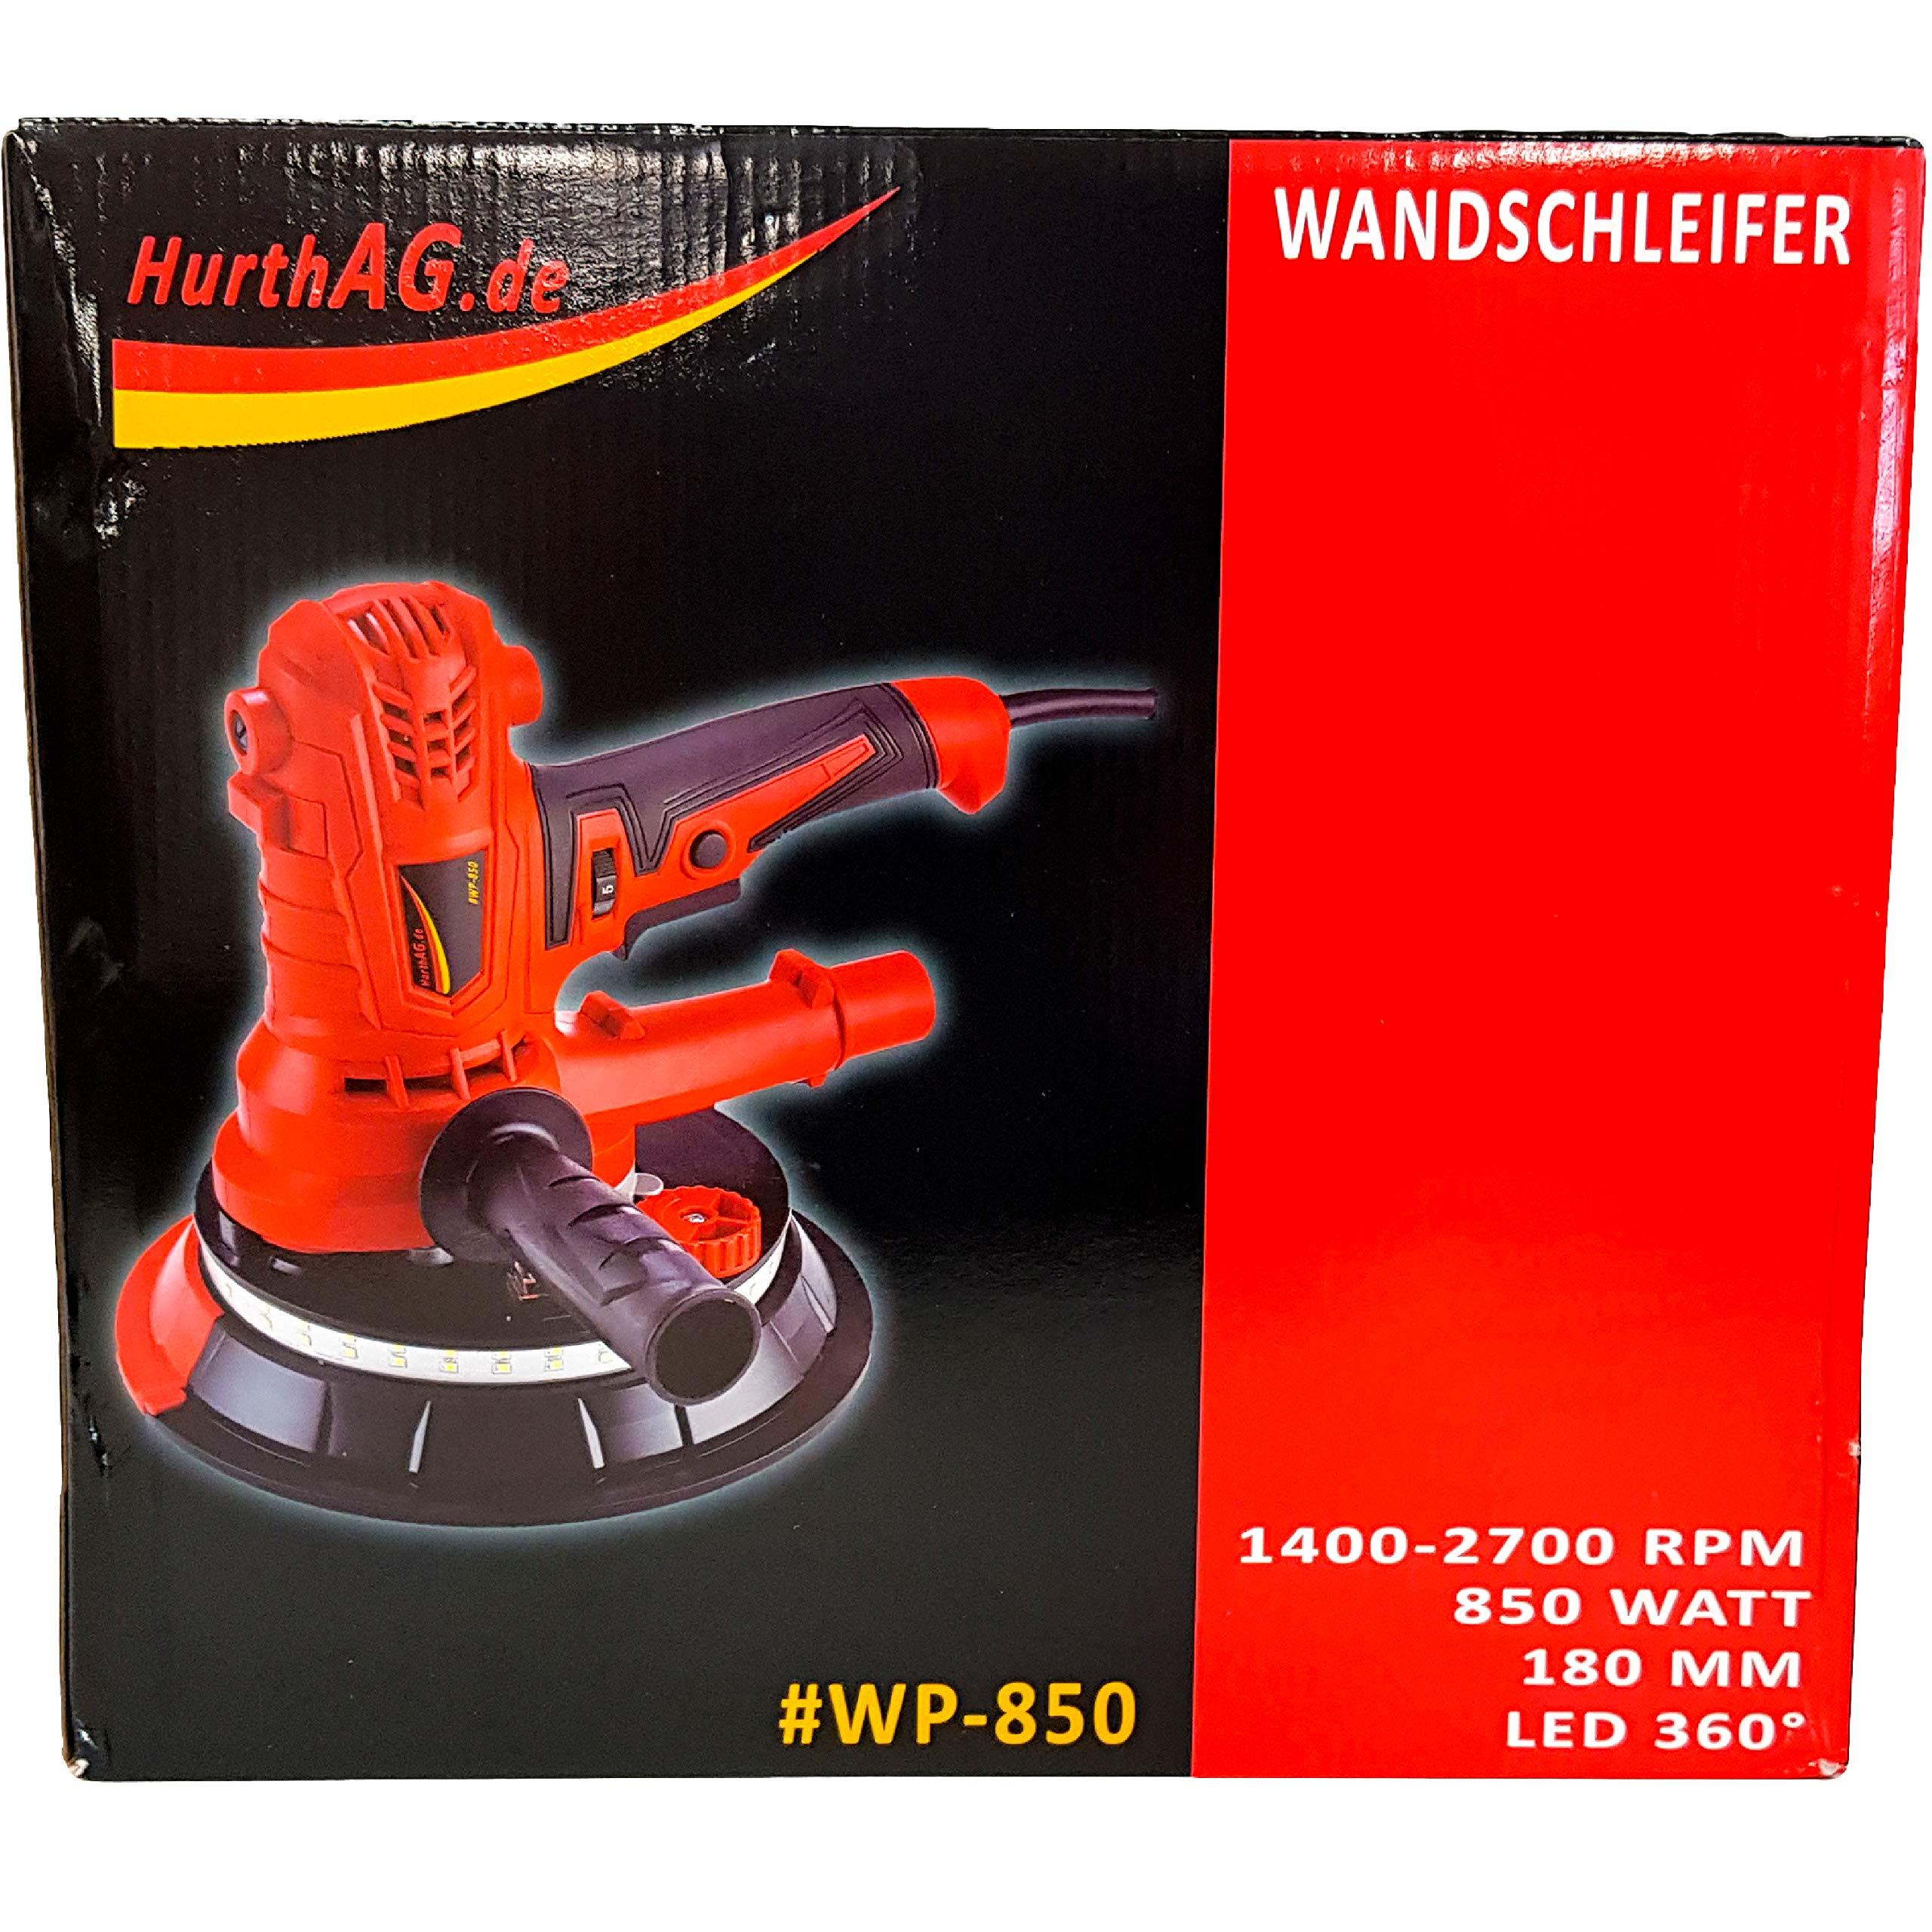 Deckenschleifer Trockenbauschleifer Absaugschlauch Soft-Griff Wandschleifer Durchmesser 180mm inkl 850W LED SMD 360/° Fangsack